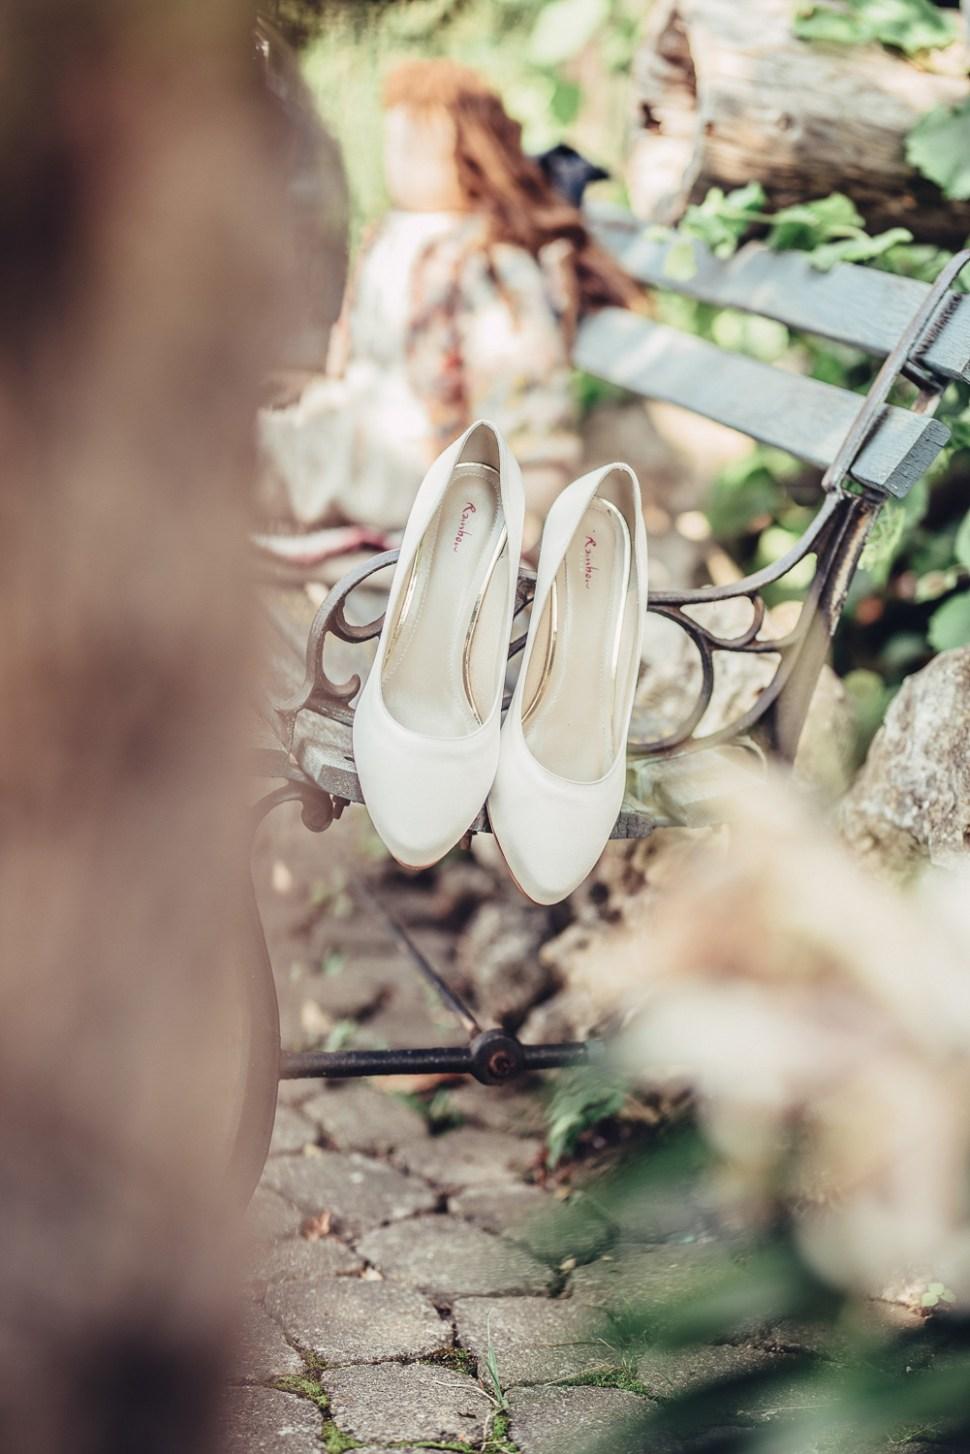 weddingaugust2018luminoxx723445-8